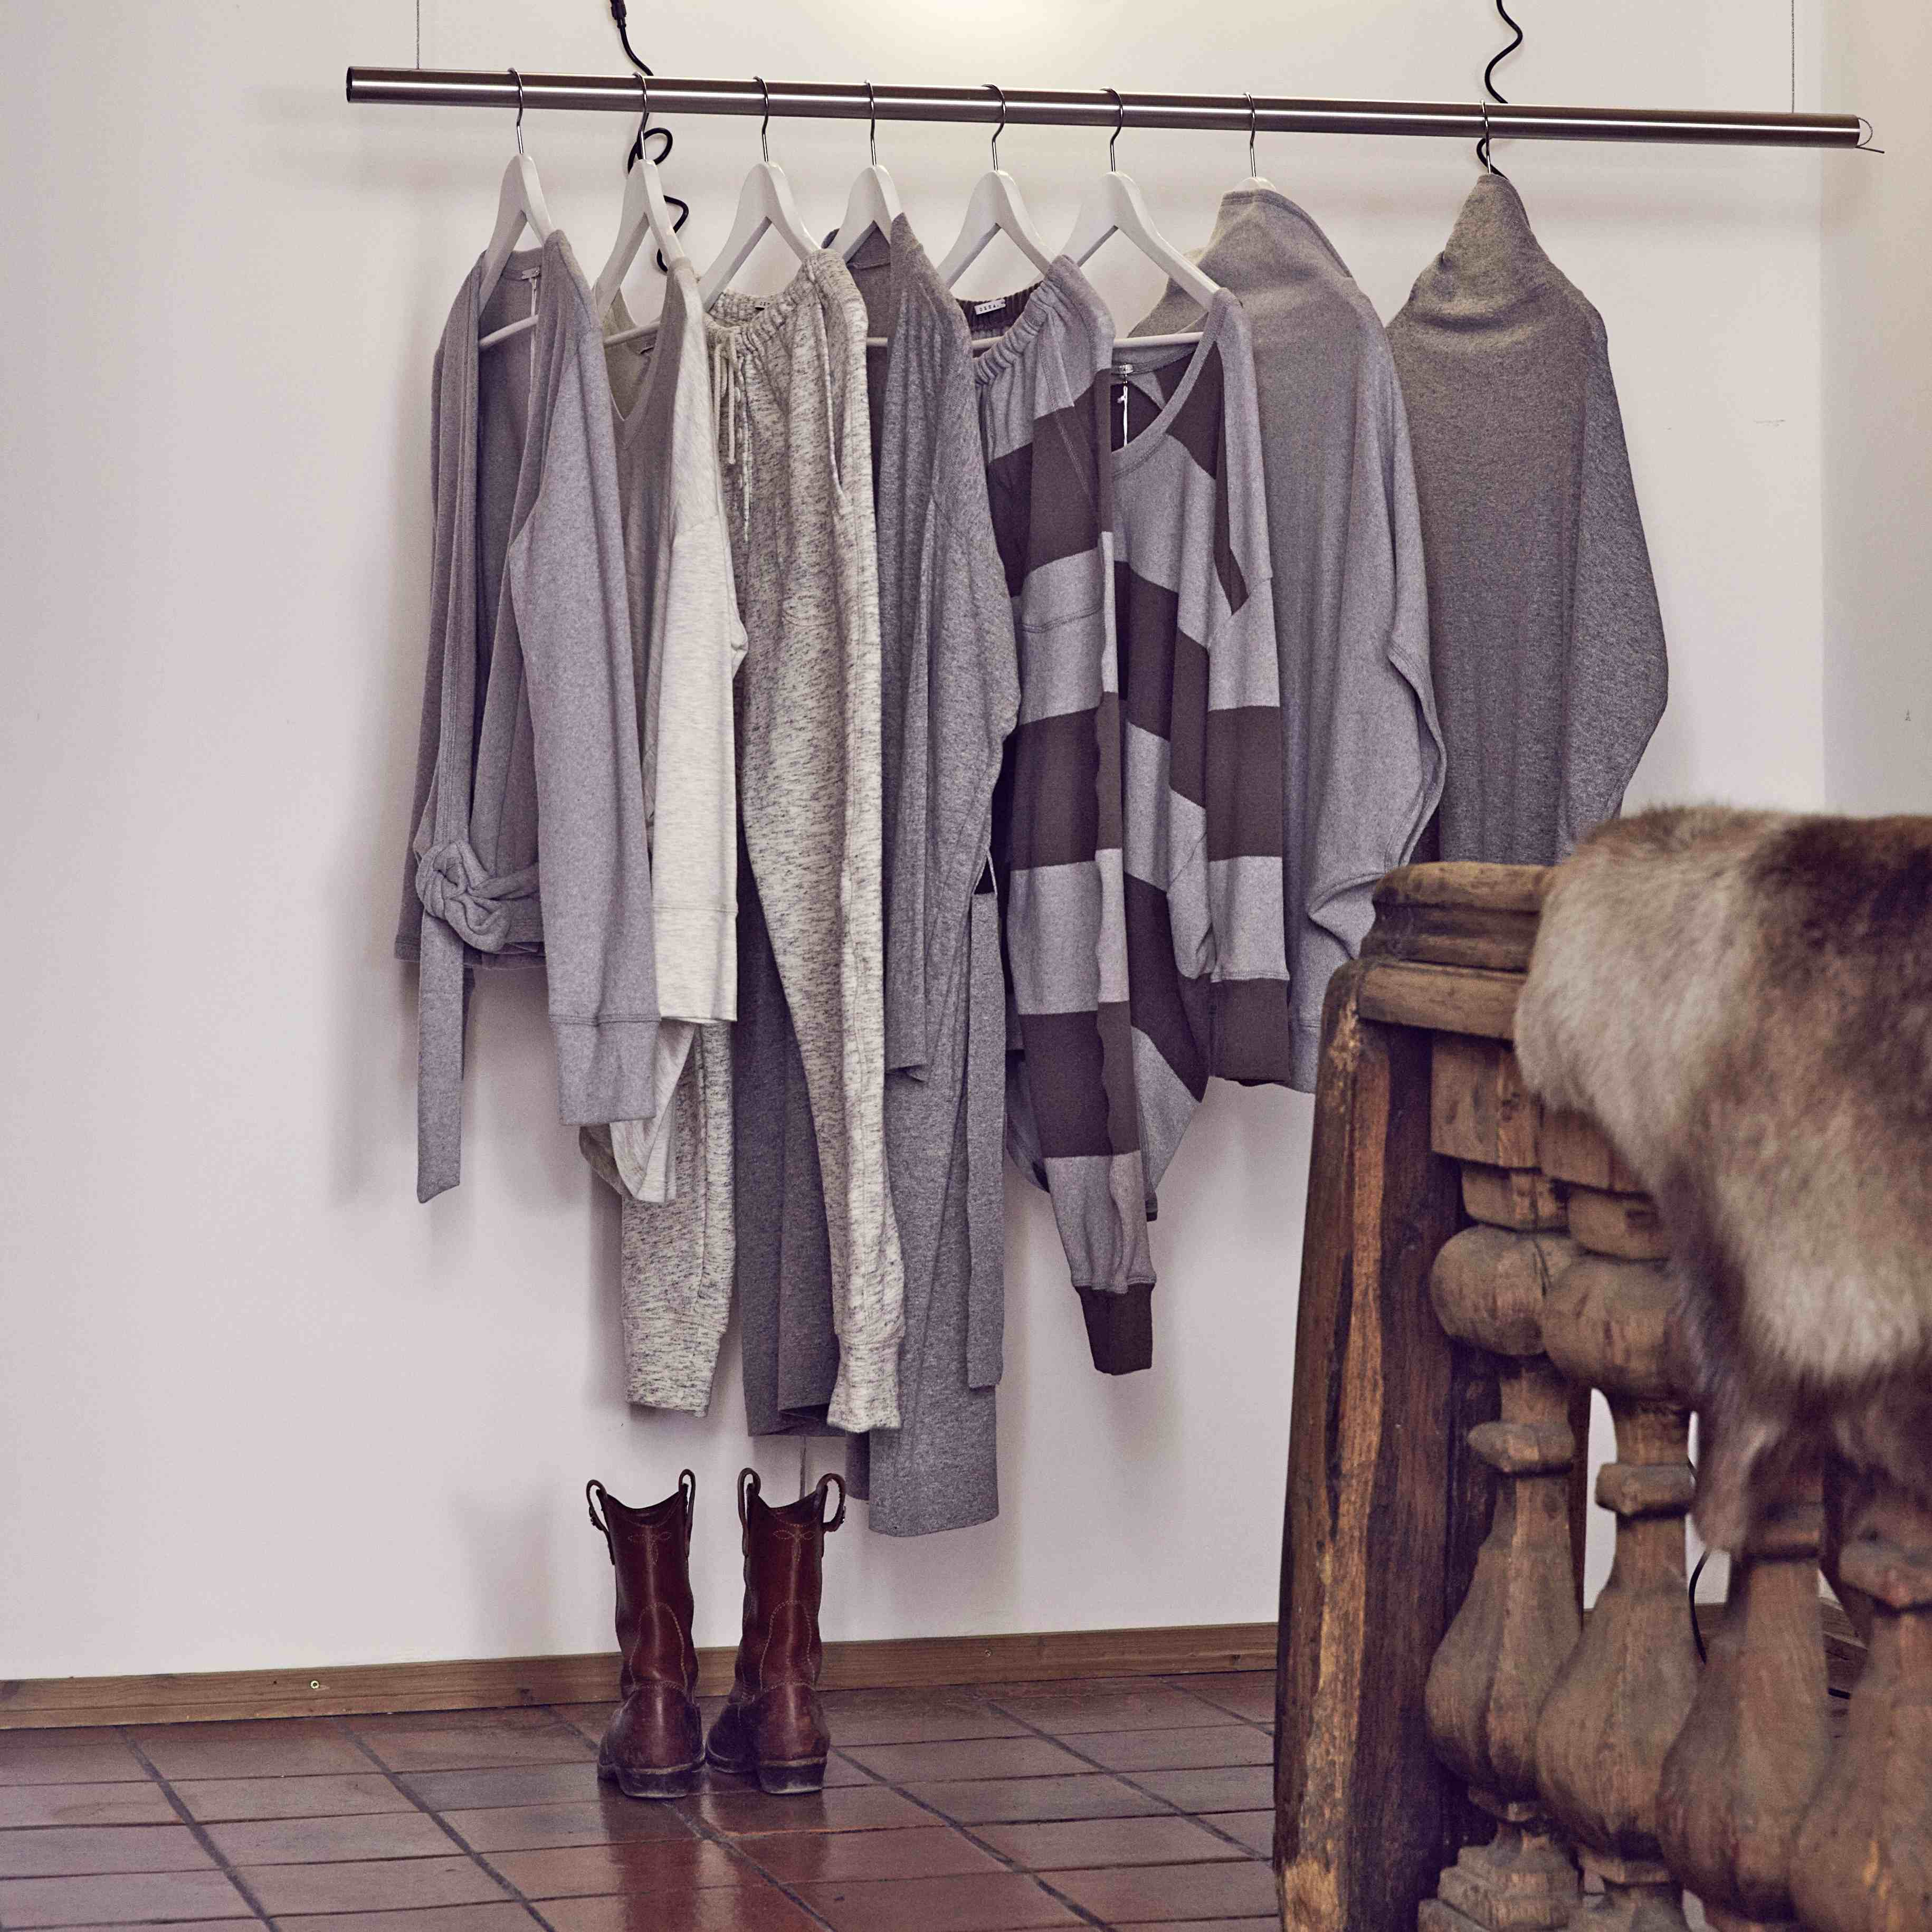 Okha-Bettwaesche-Sunday-in-Bed-online-bestellen-6